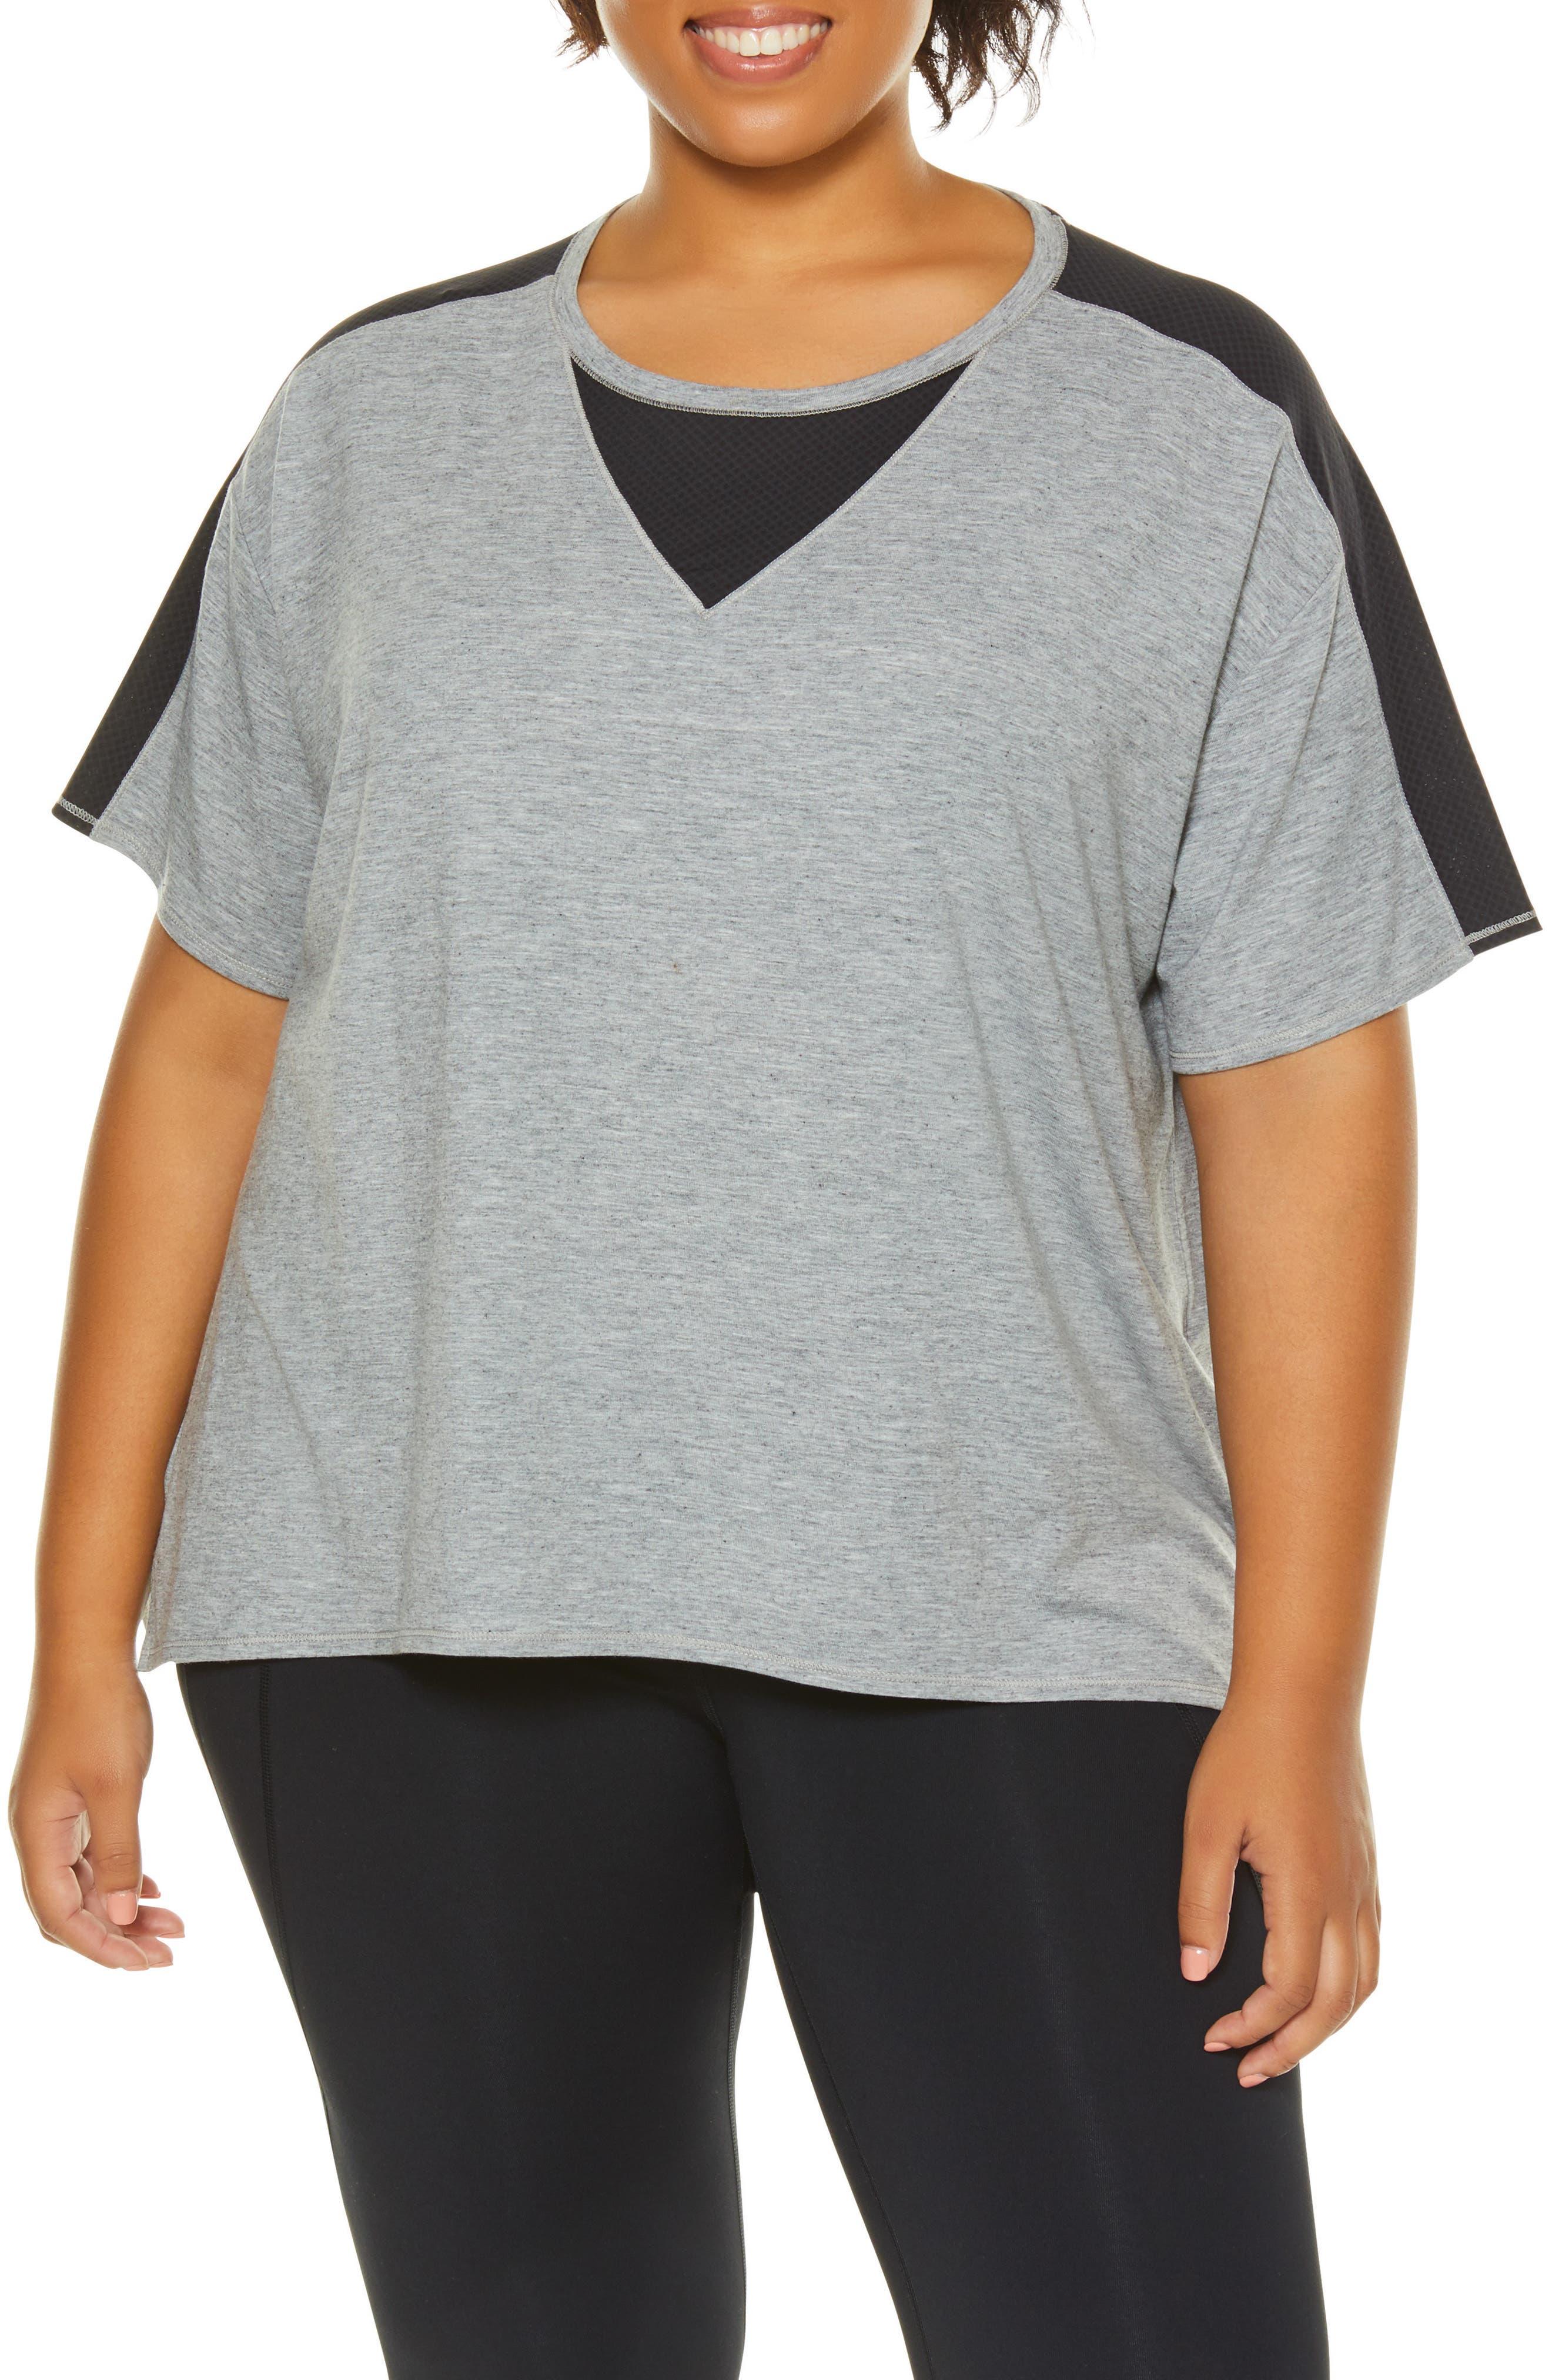 Plus Size Shape Activewear Captivate Tee, Black